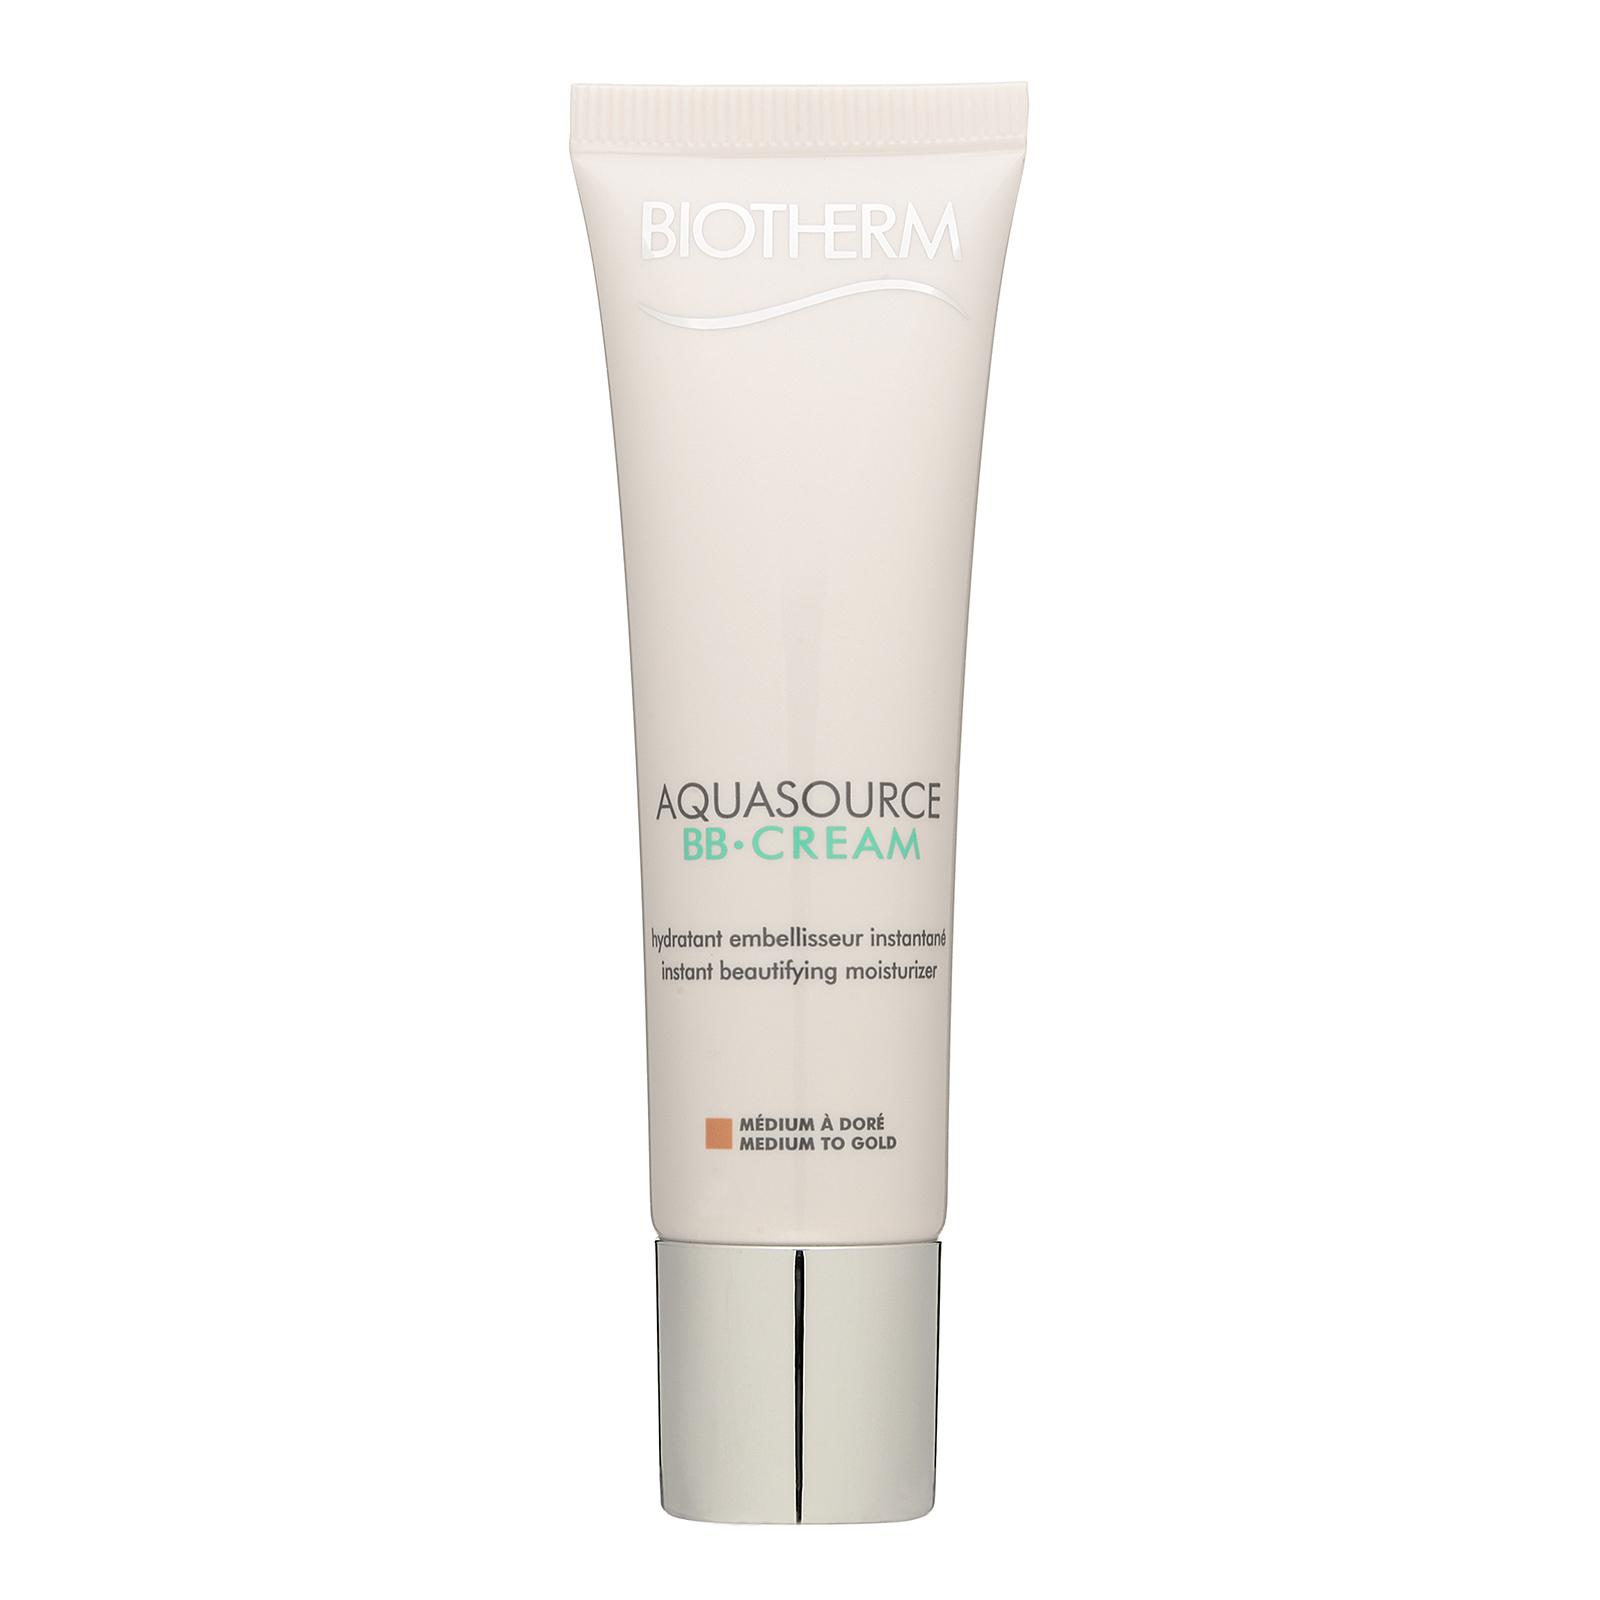 Biotherm Aquasource  BB Cream Instant Beautifying Moisturizer FPS / SPF15 Medium To Gold, 1.01oz, 30ml